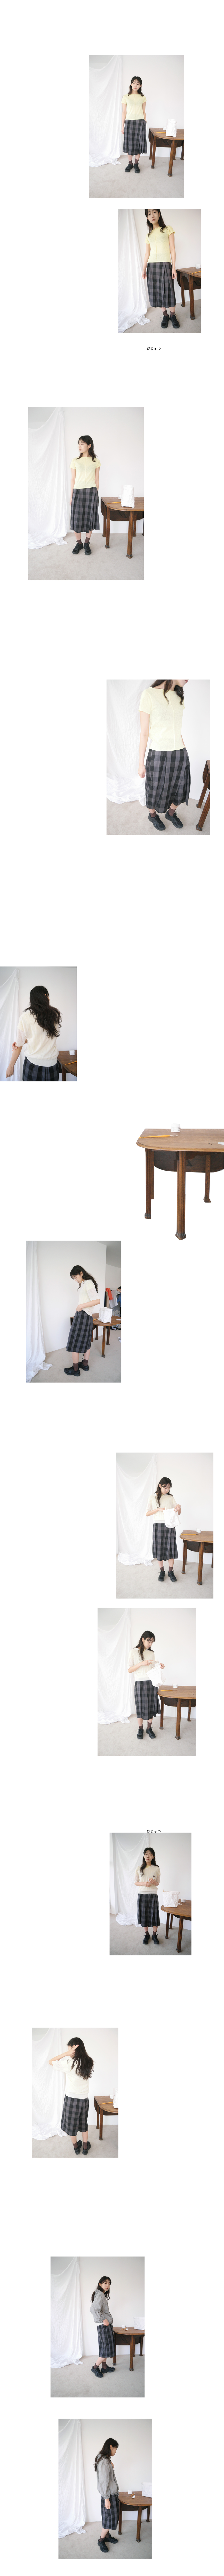 see-through vintage knit